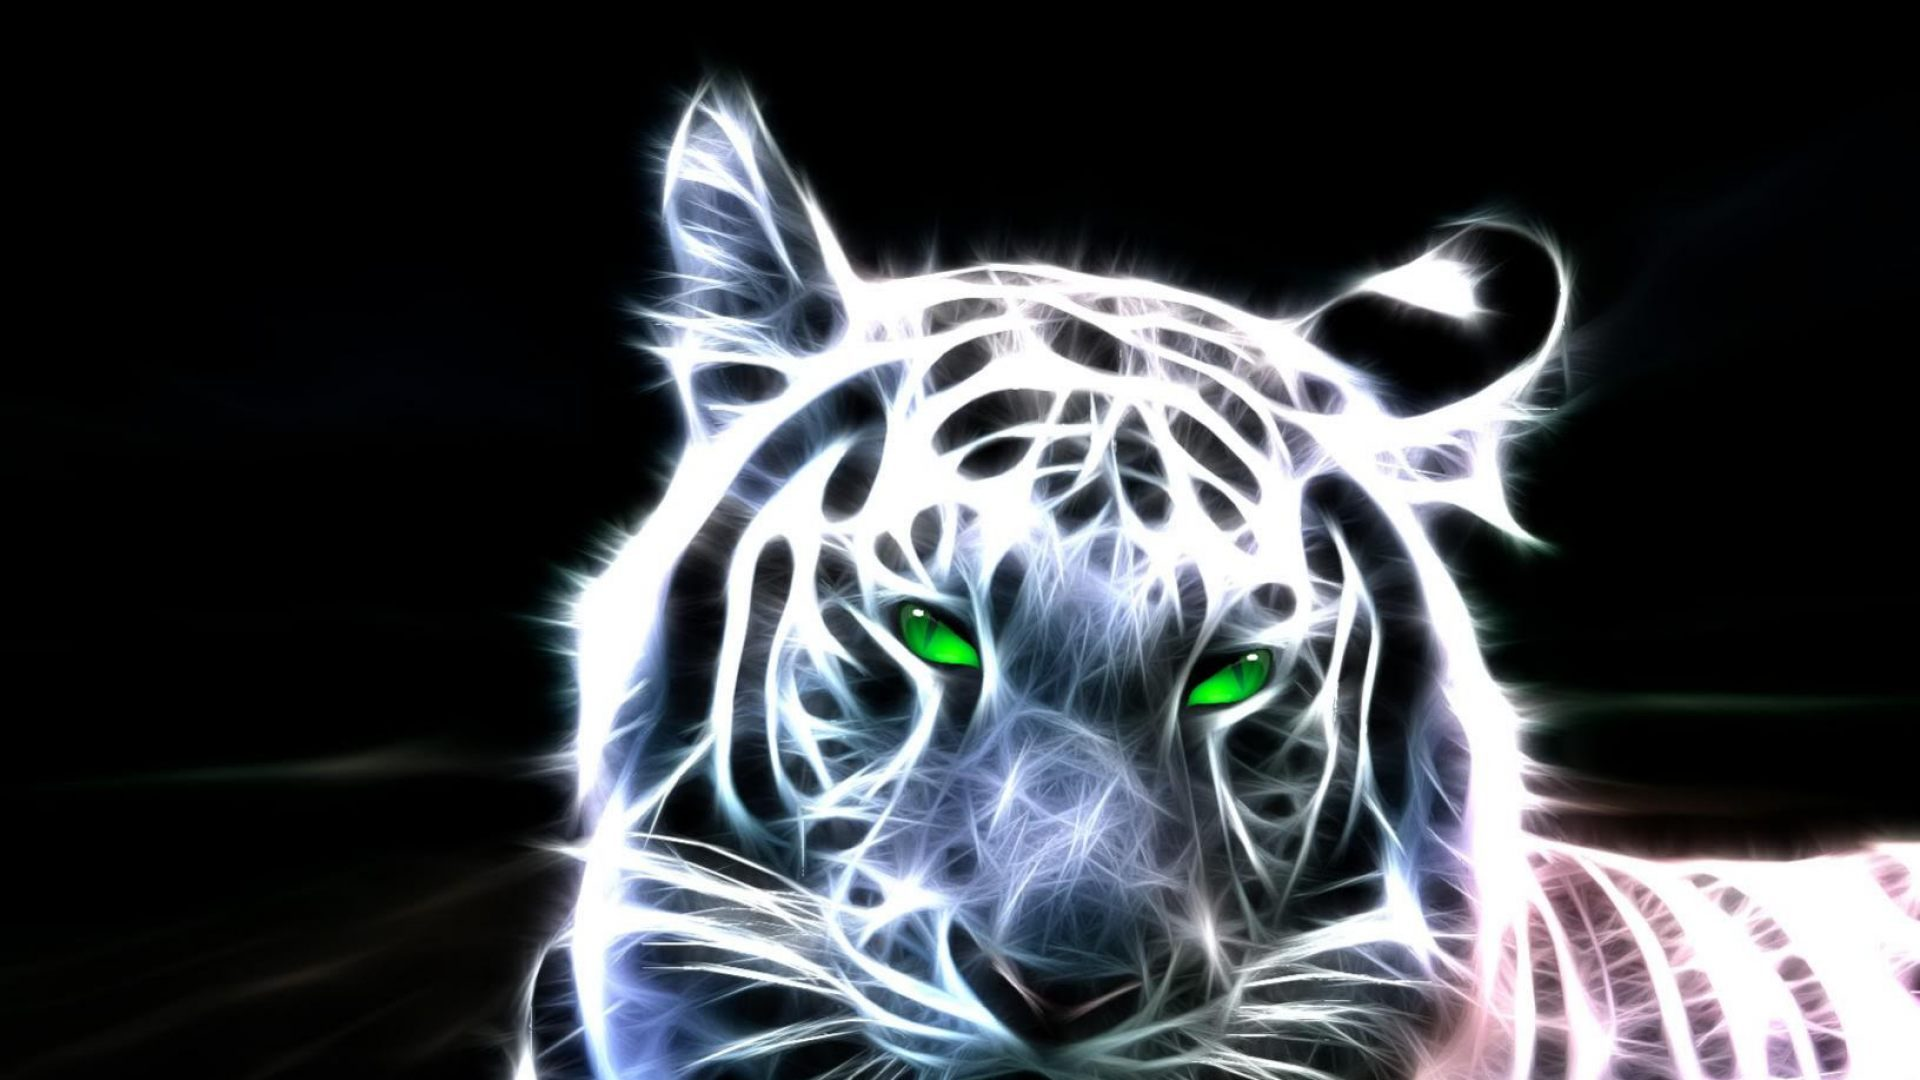 Impresión del tigre Wallpaper